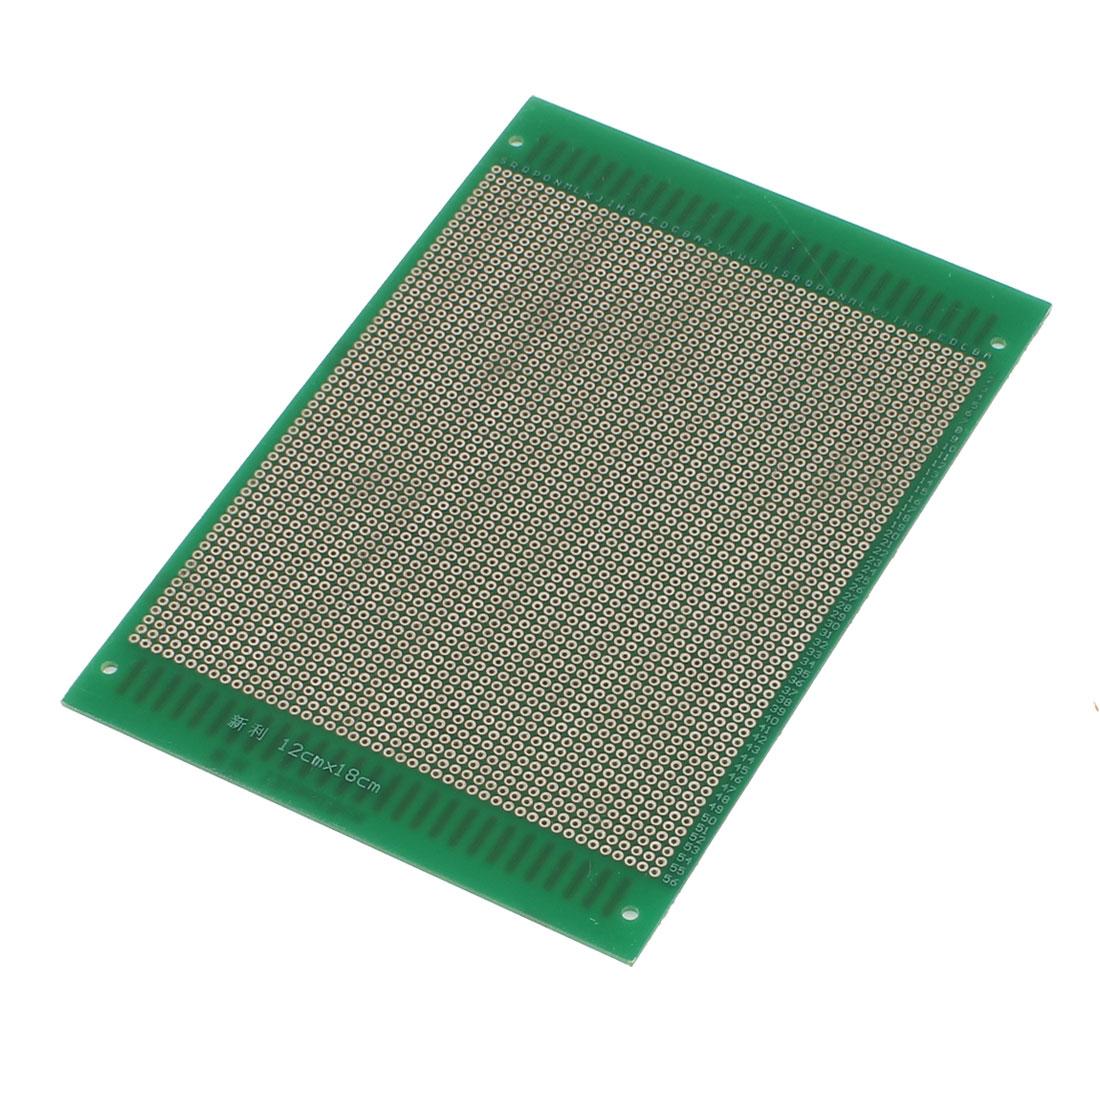 12cm x 18cm Electronic DIY Prototype Paper Double Side PCB Universal Board